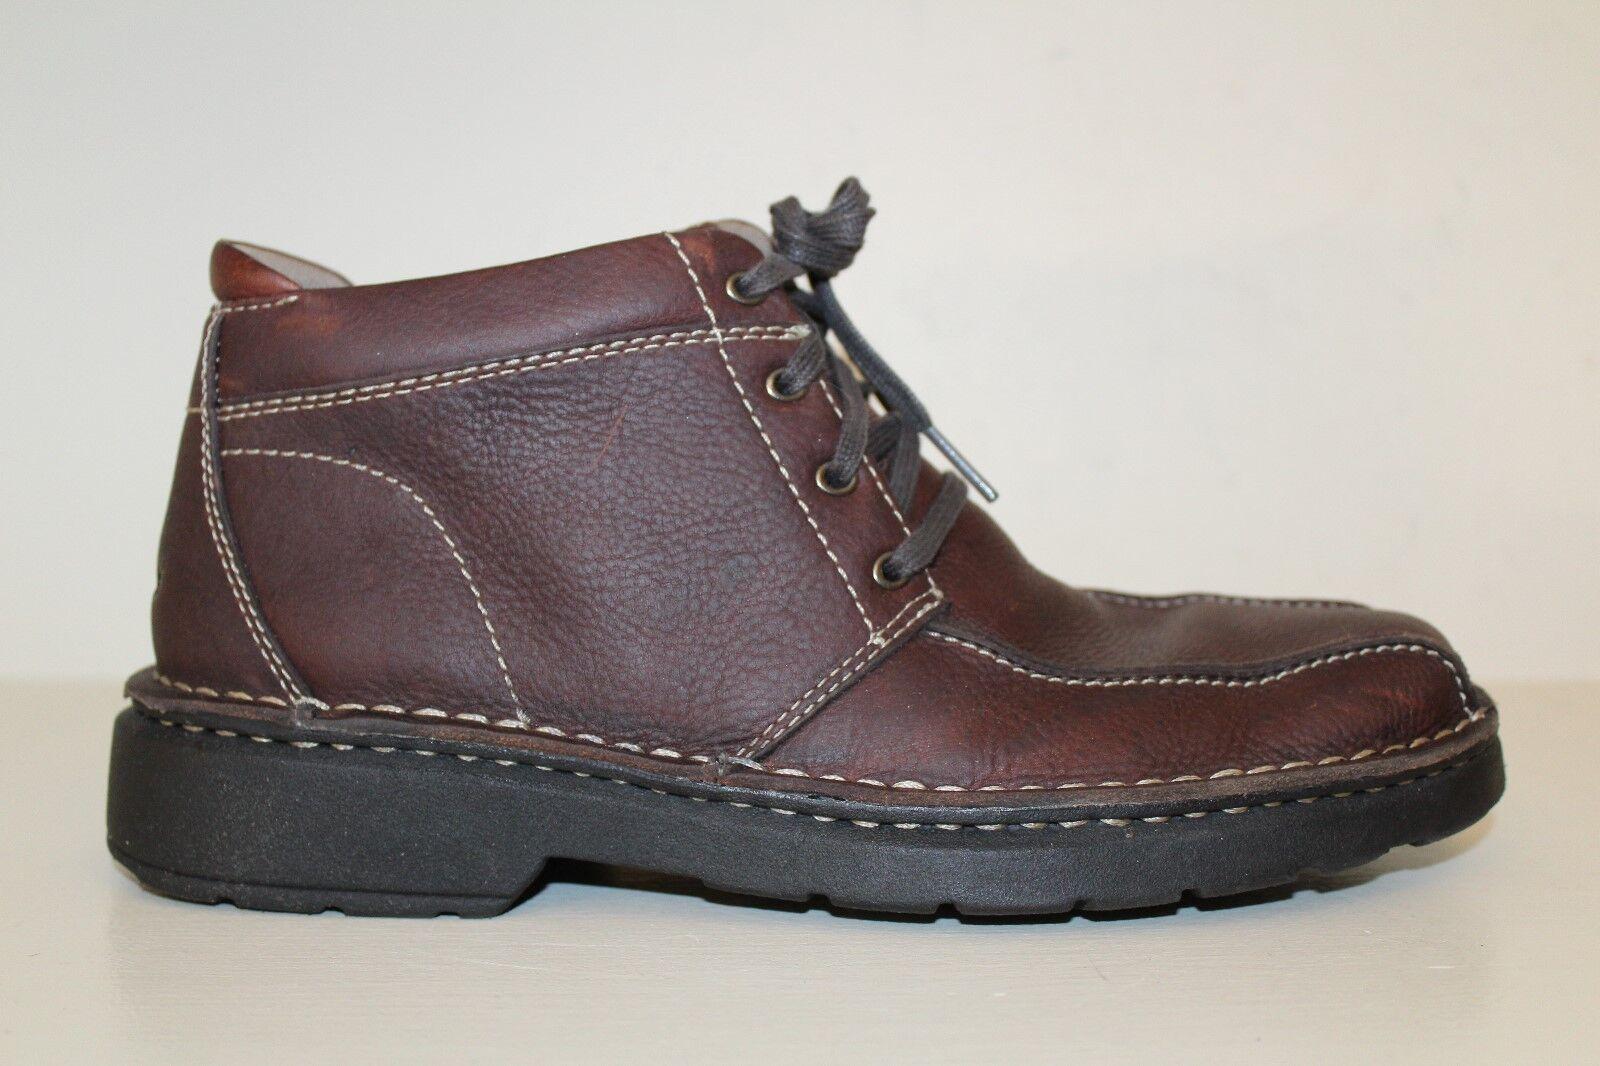 CLARKS Mens Ankle Boots Sz 7.5 M Gerrard 72183 Brown Leather Lace Up shoes